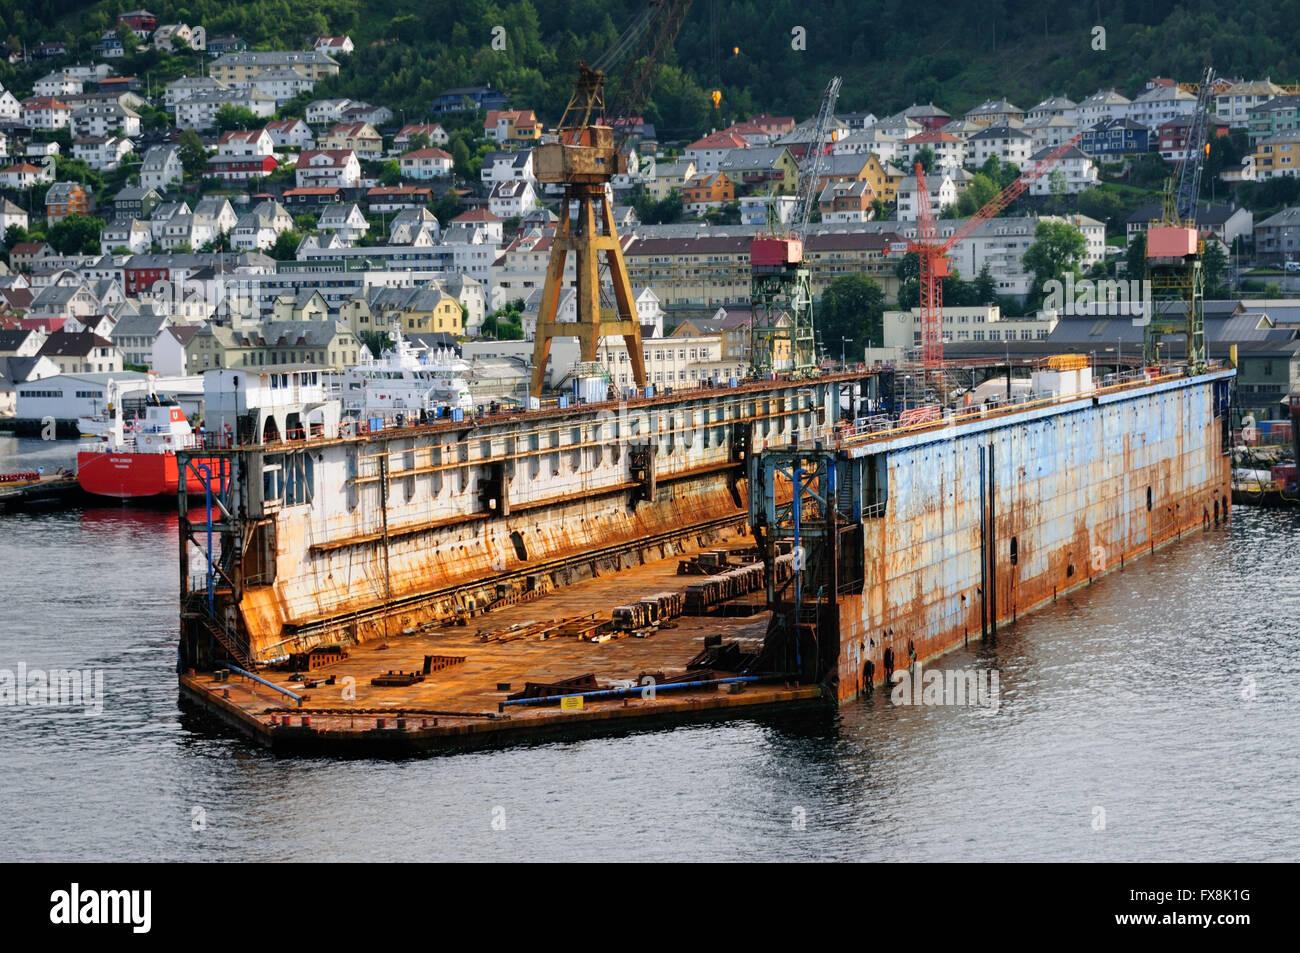 Floating dry dock in Bergen. - Stock Image